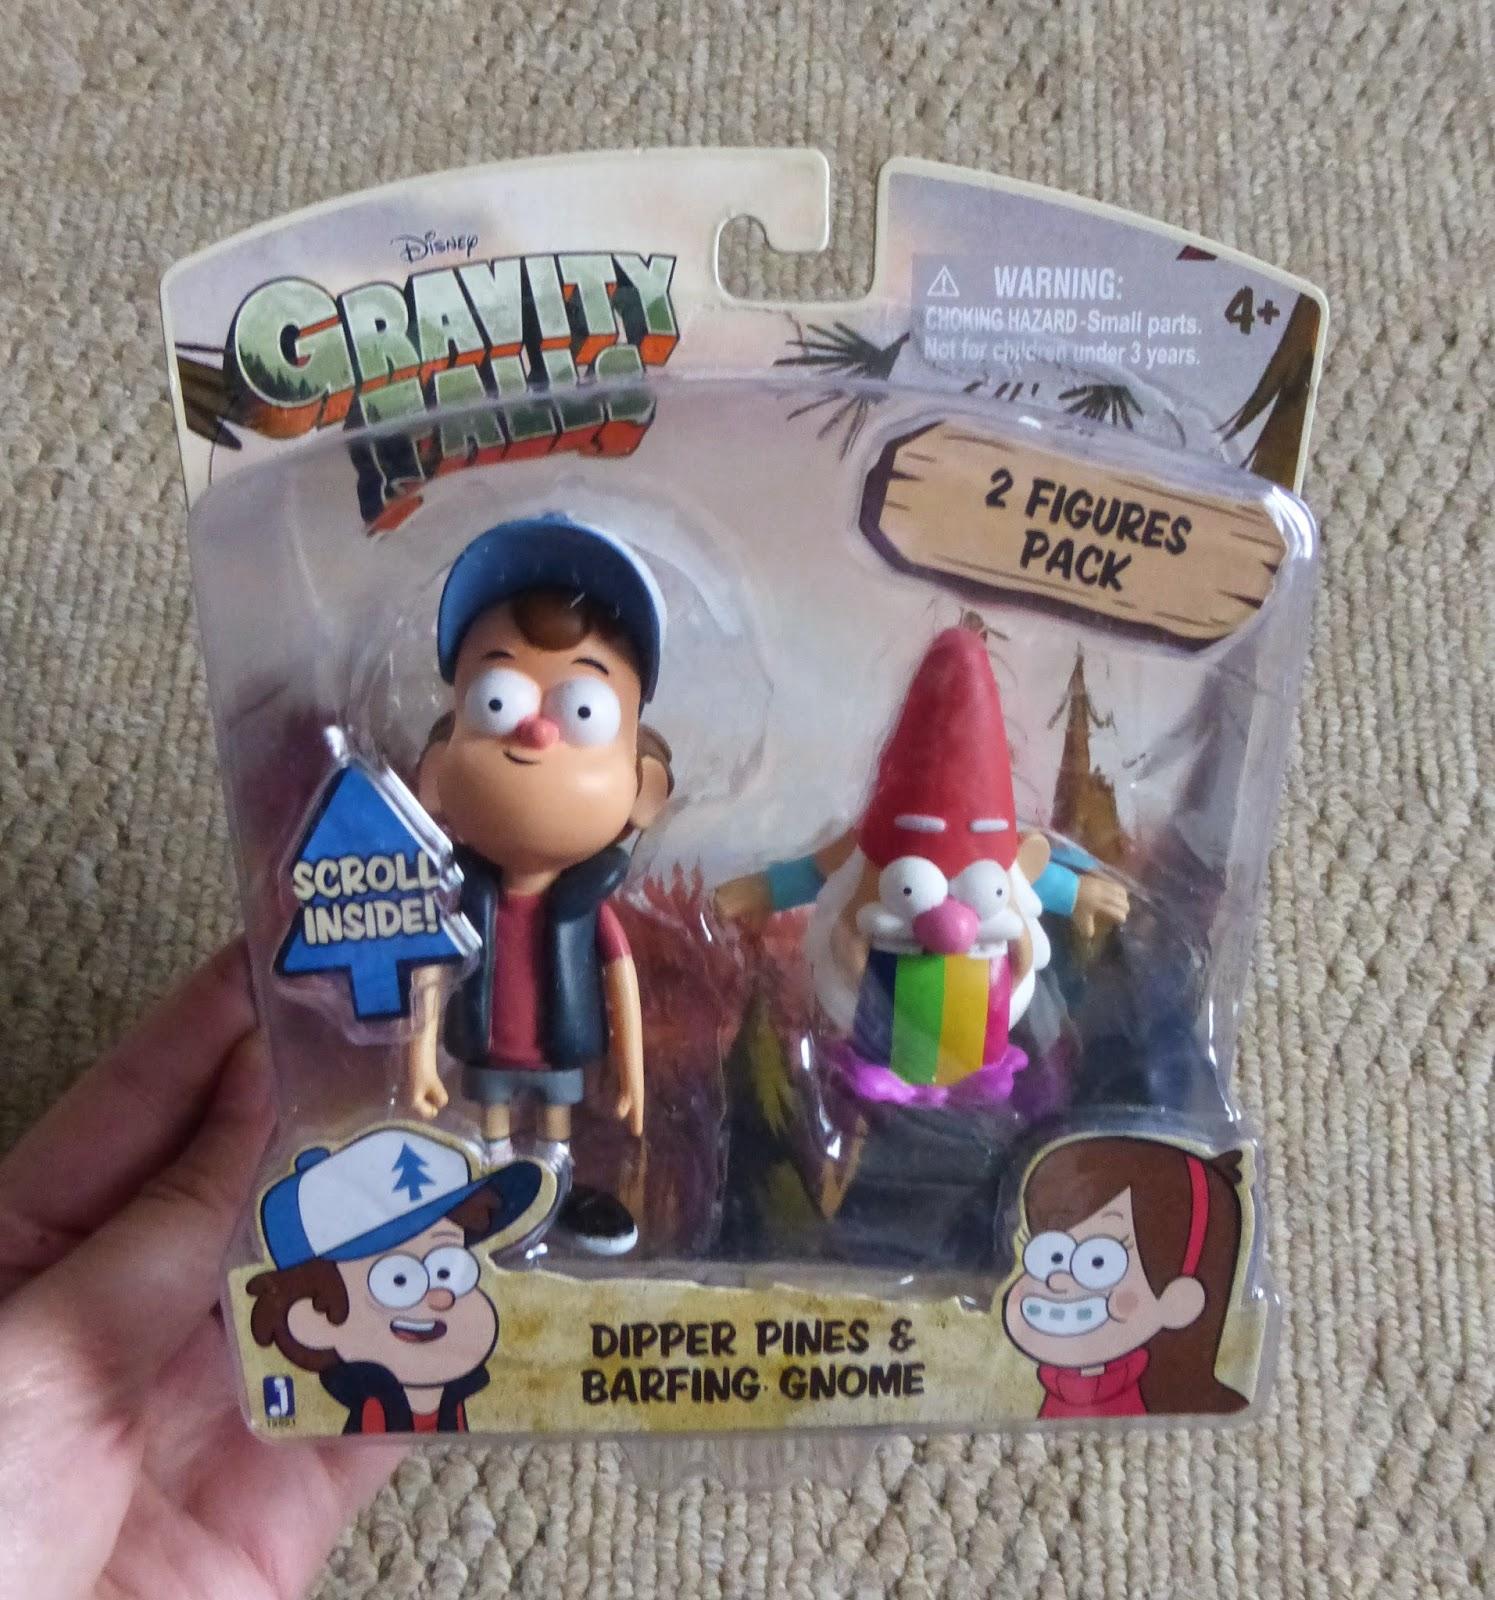 Gravity Falls Figures Toys r us Jazware Gravity Falls Toy